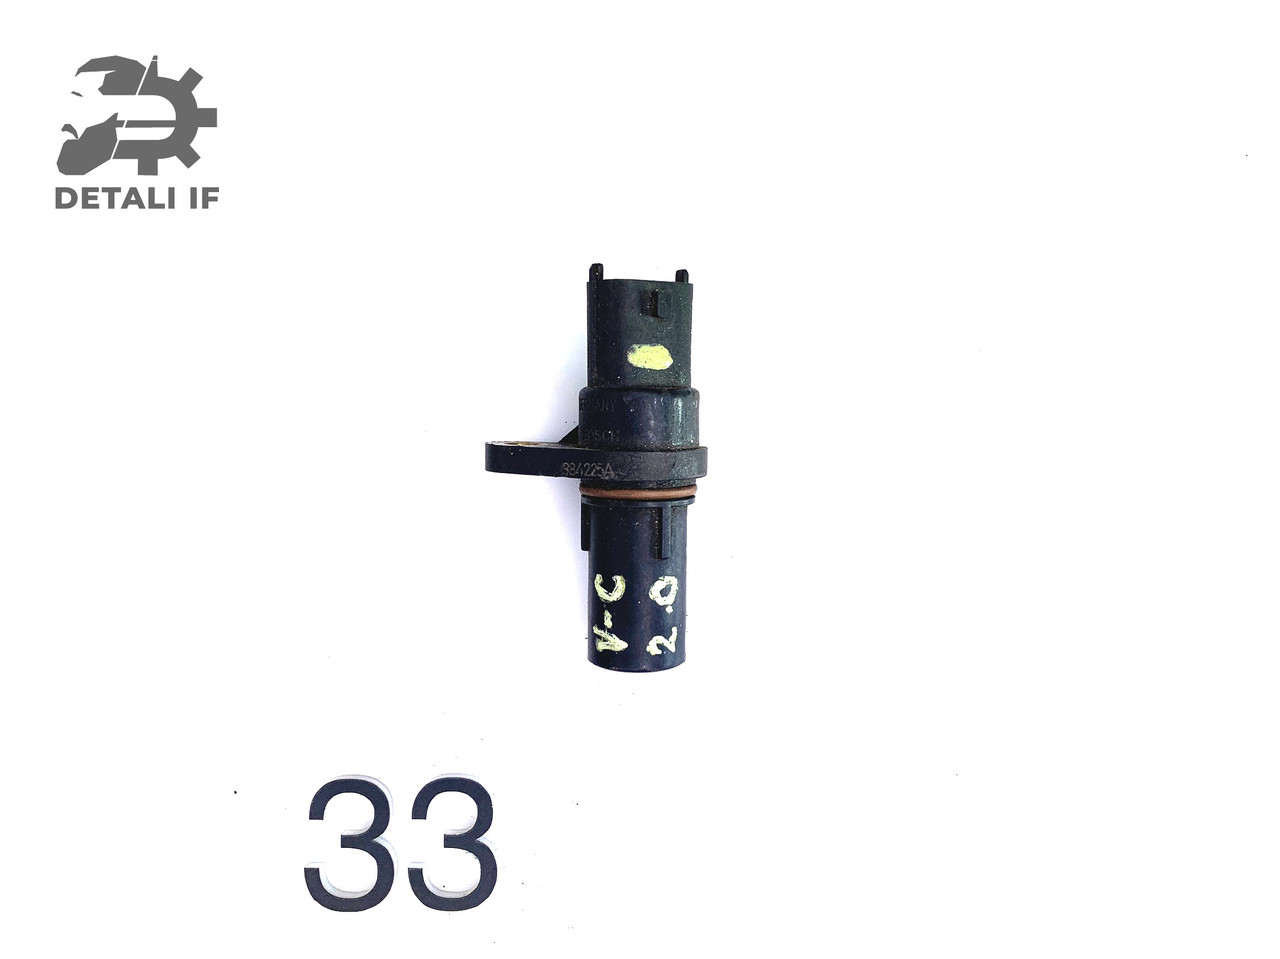 Датчик коленвала Opel Vectra C Signum 2.0T z20net 0261210229 №33